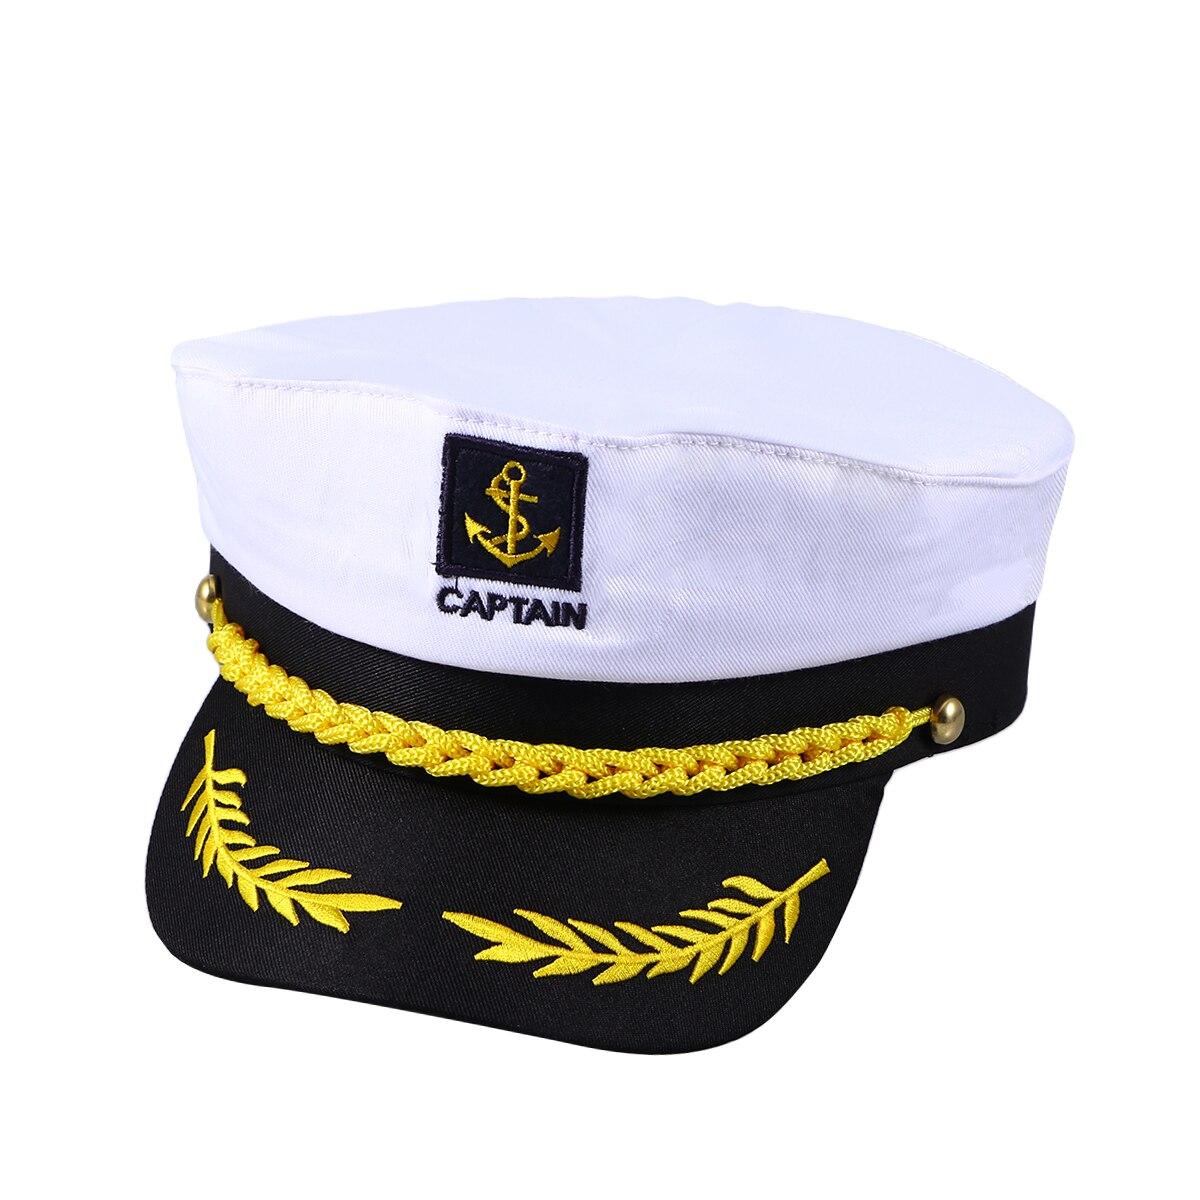 UK UNISEX YACHT BOAT SHIP SAILOR CAPTAIN COSTUME HAT CAP NAVY MARINE ADMIRAL HAT